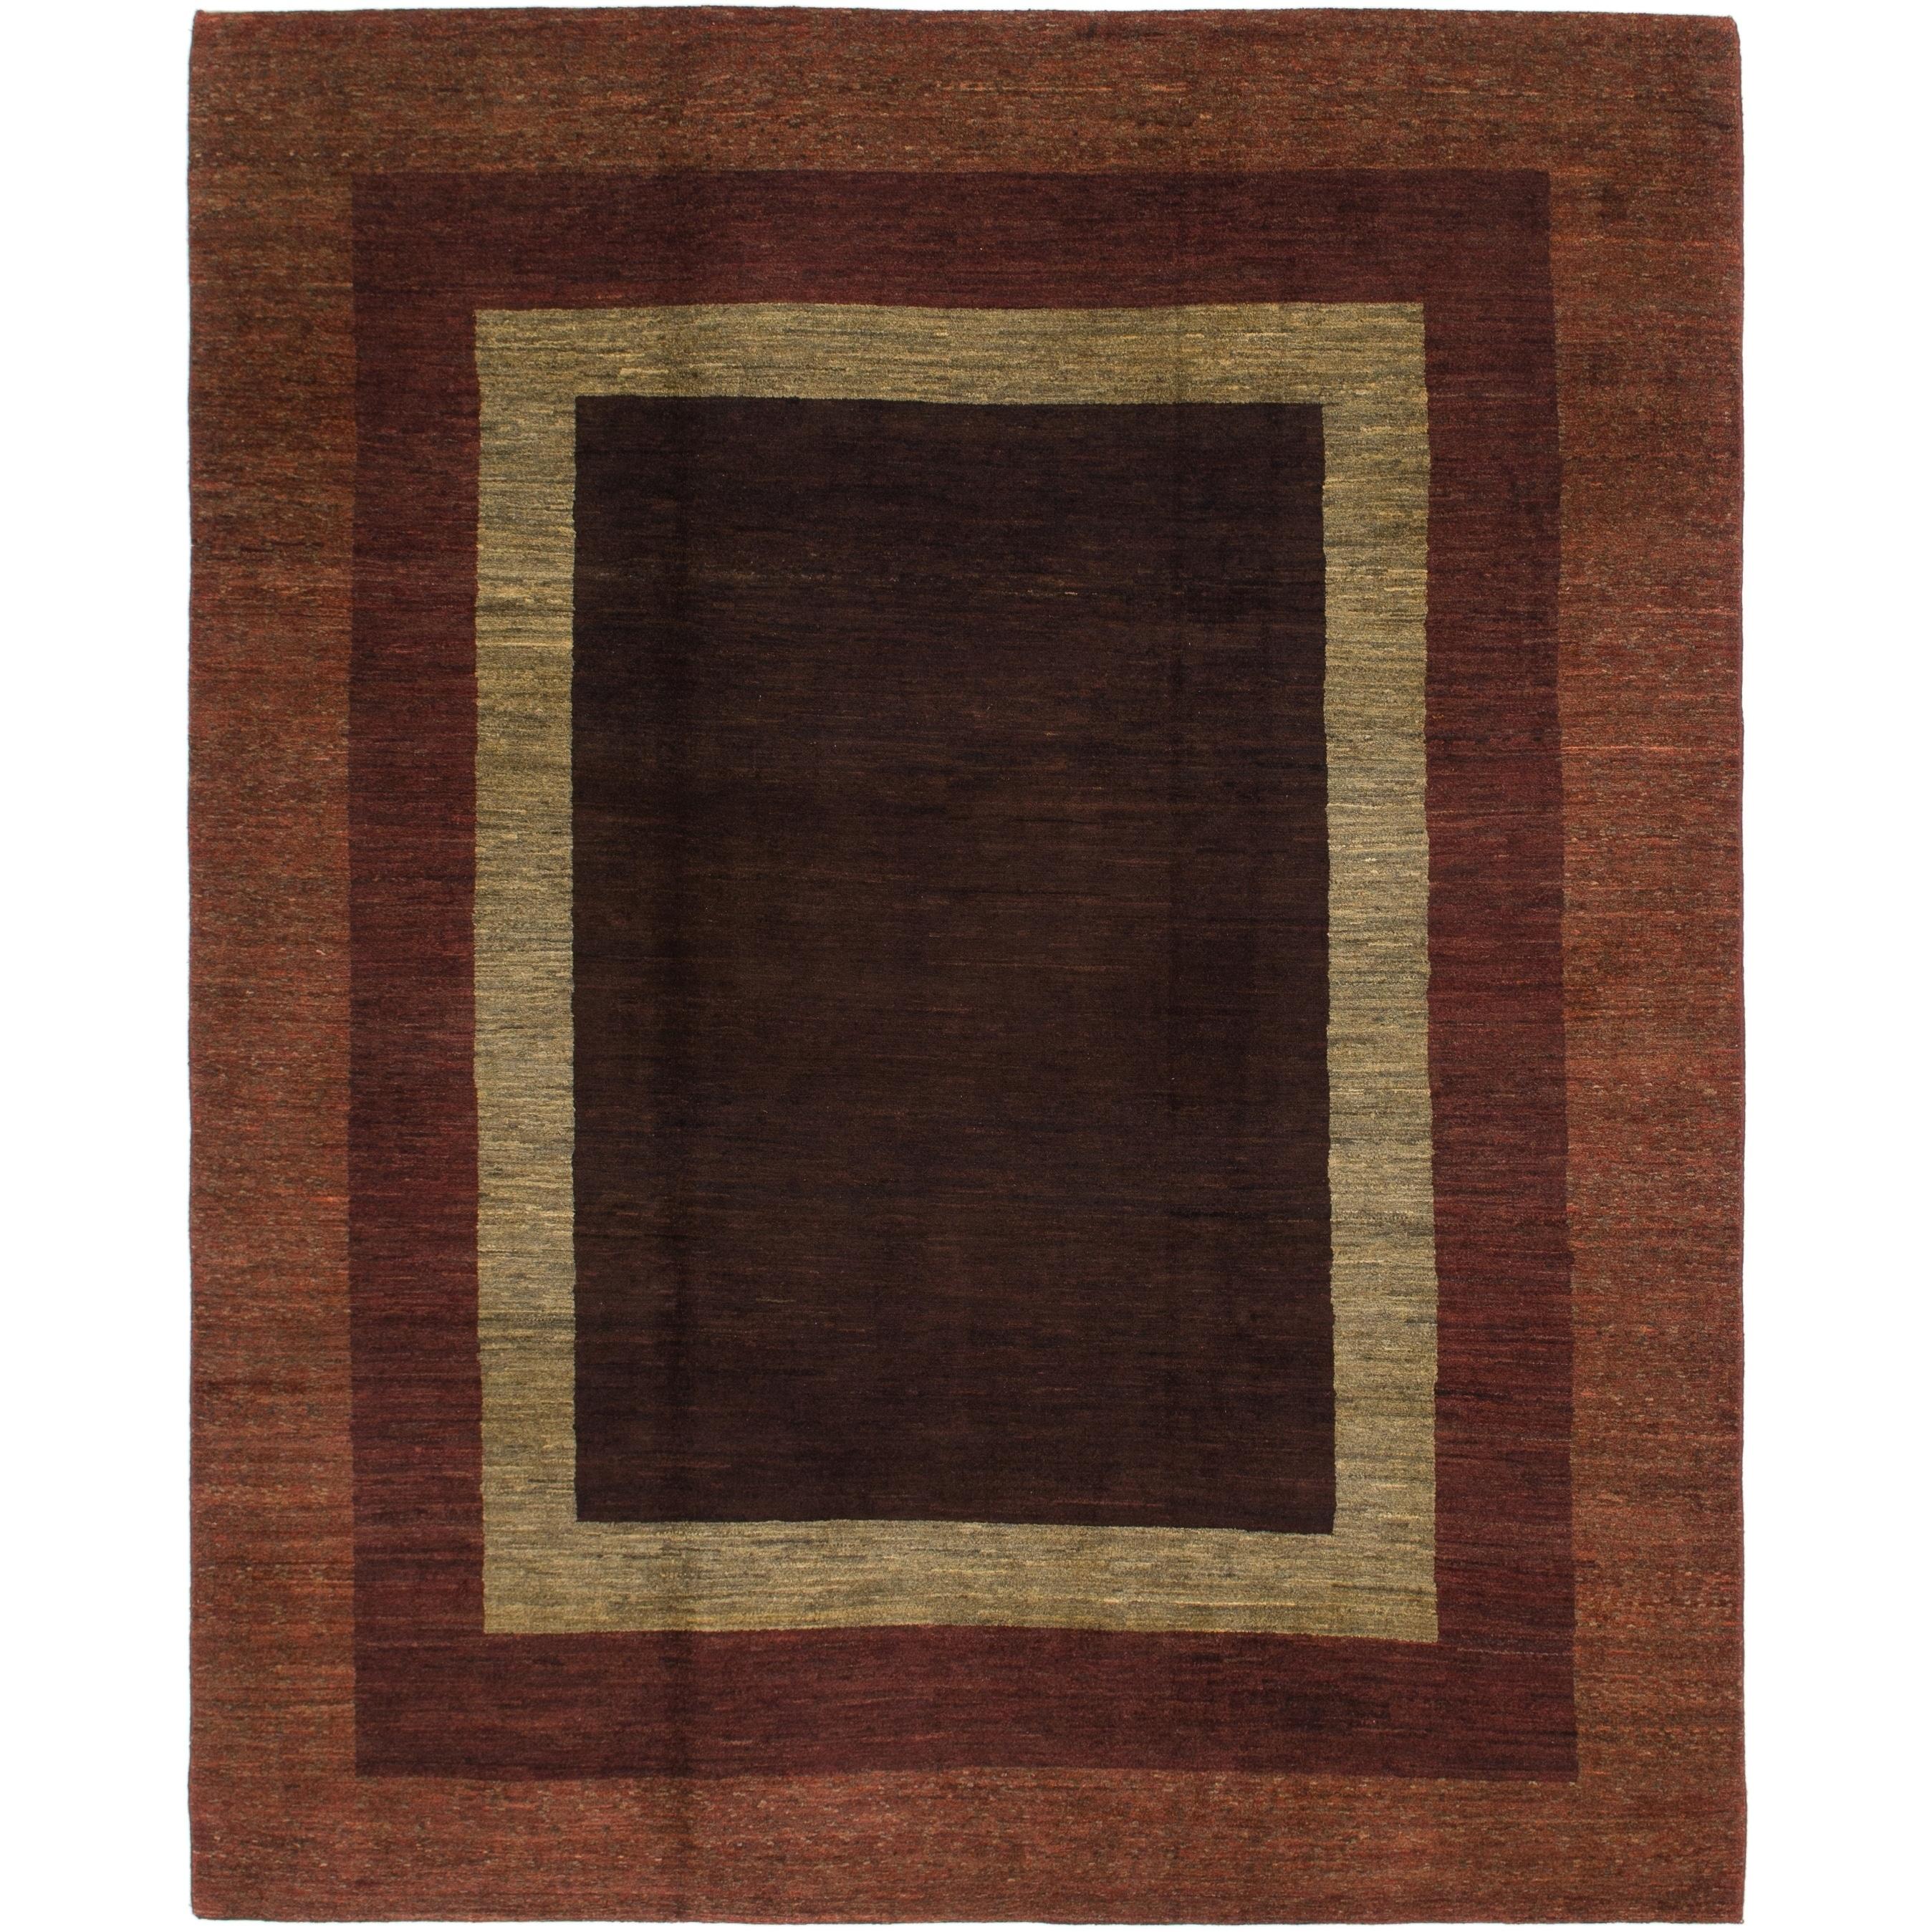 Hand Knotted Kashkuli Gabbeh Wool Area Rug - 8 x 9 8 (Maroon - 8 x 9 8)